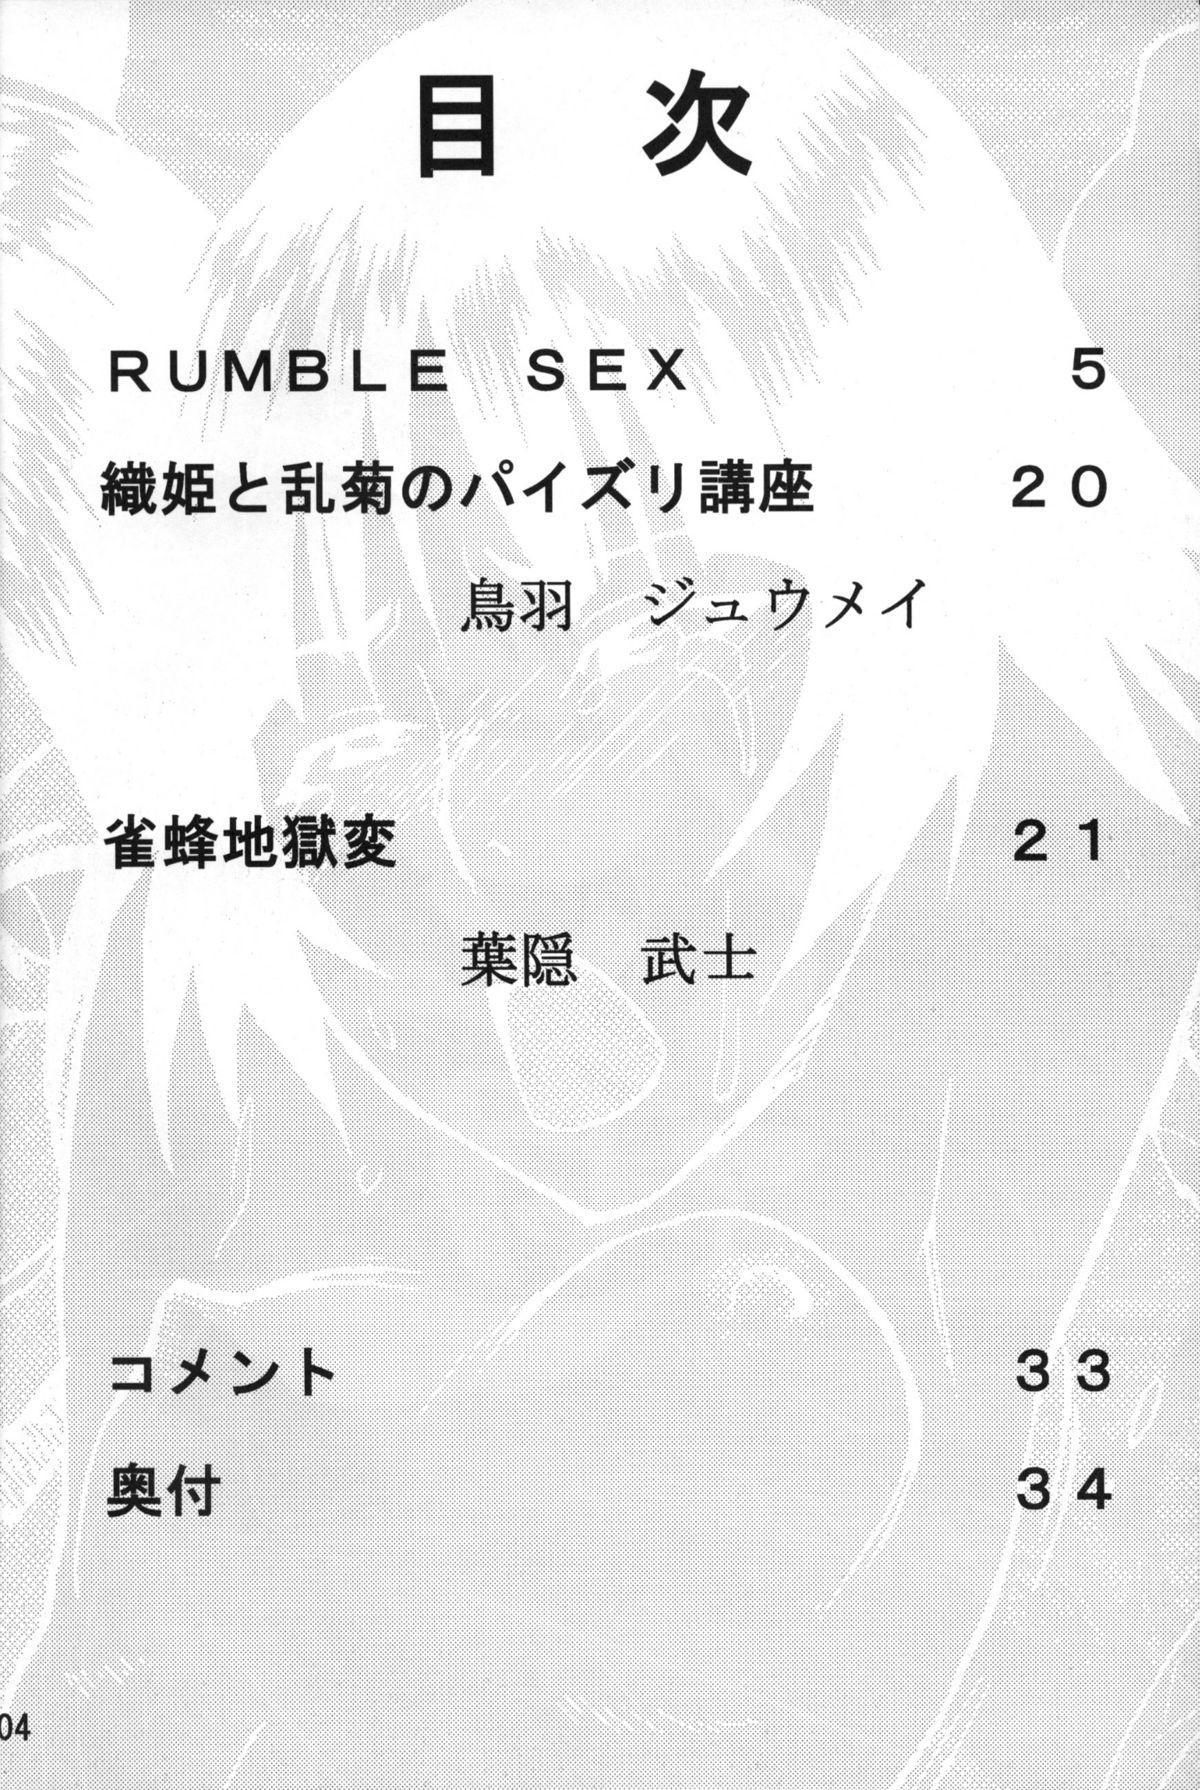 Kidou 2